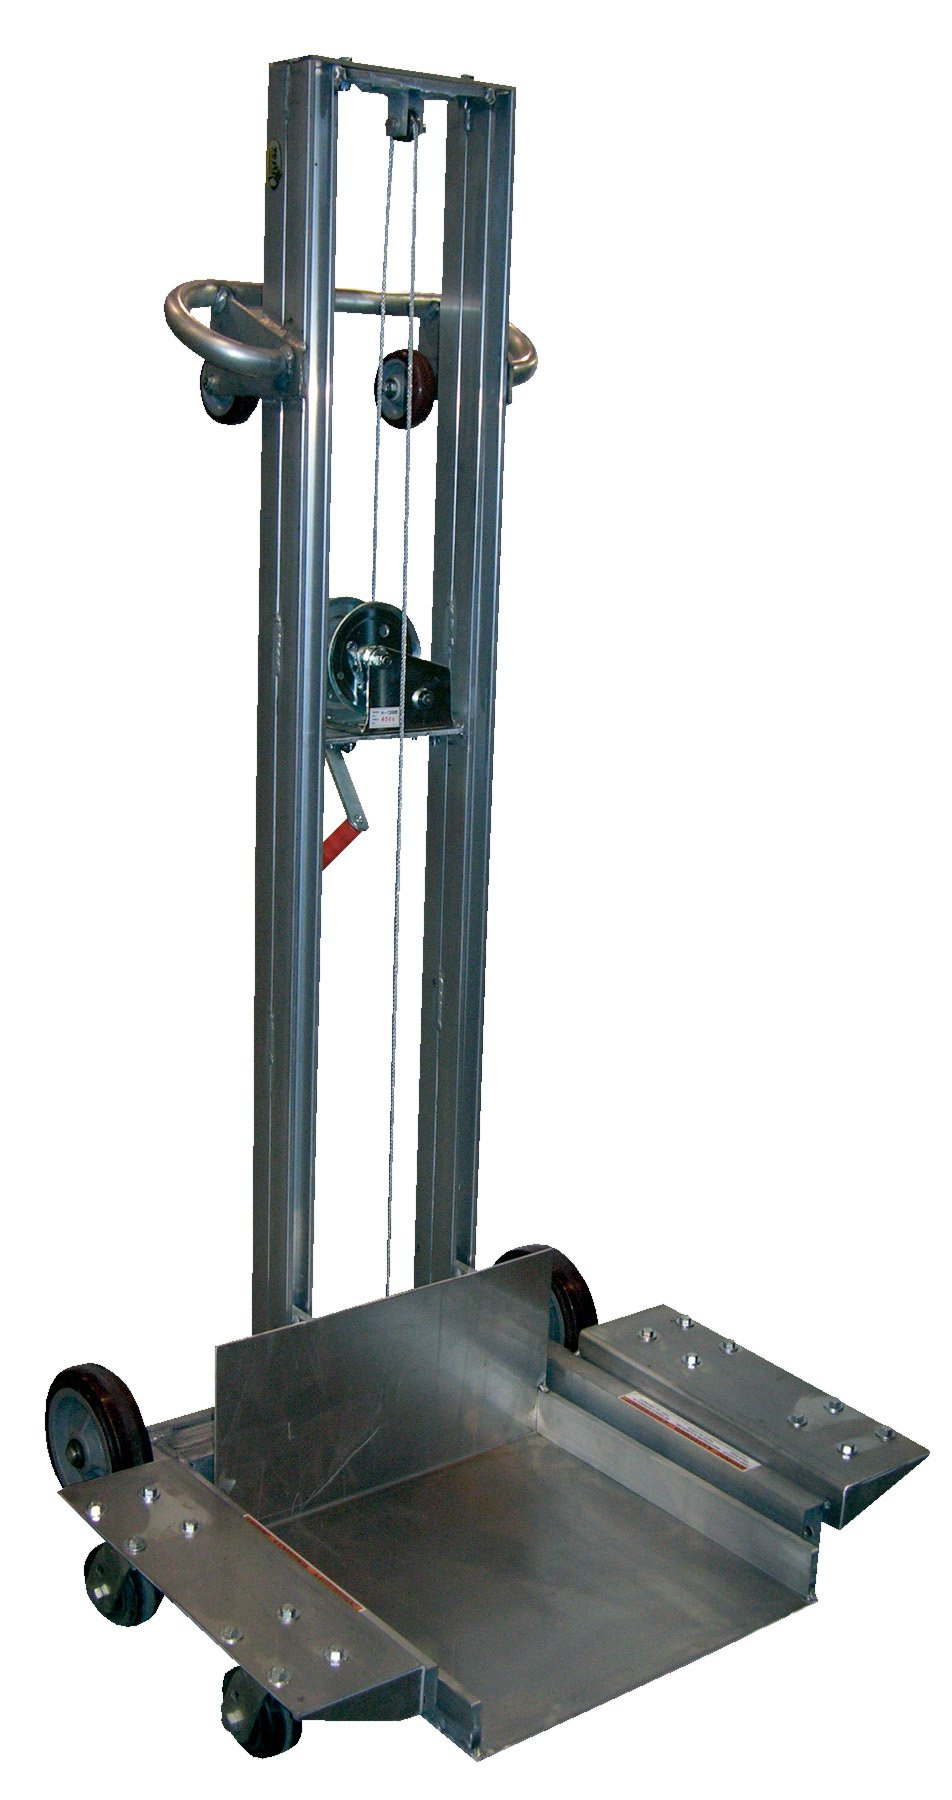 Vestil ALLPW-500-4SFL Aluminum Low Profile Lite Load Lift with Manual Operation, 400 Capacity, 20'' Length x 20'' Width Platform